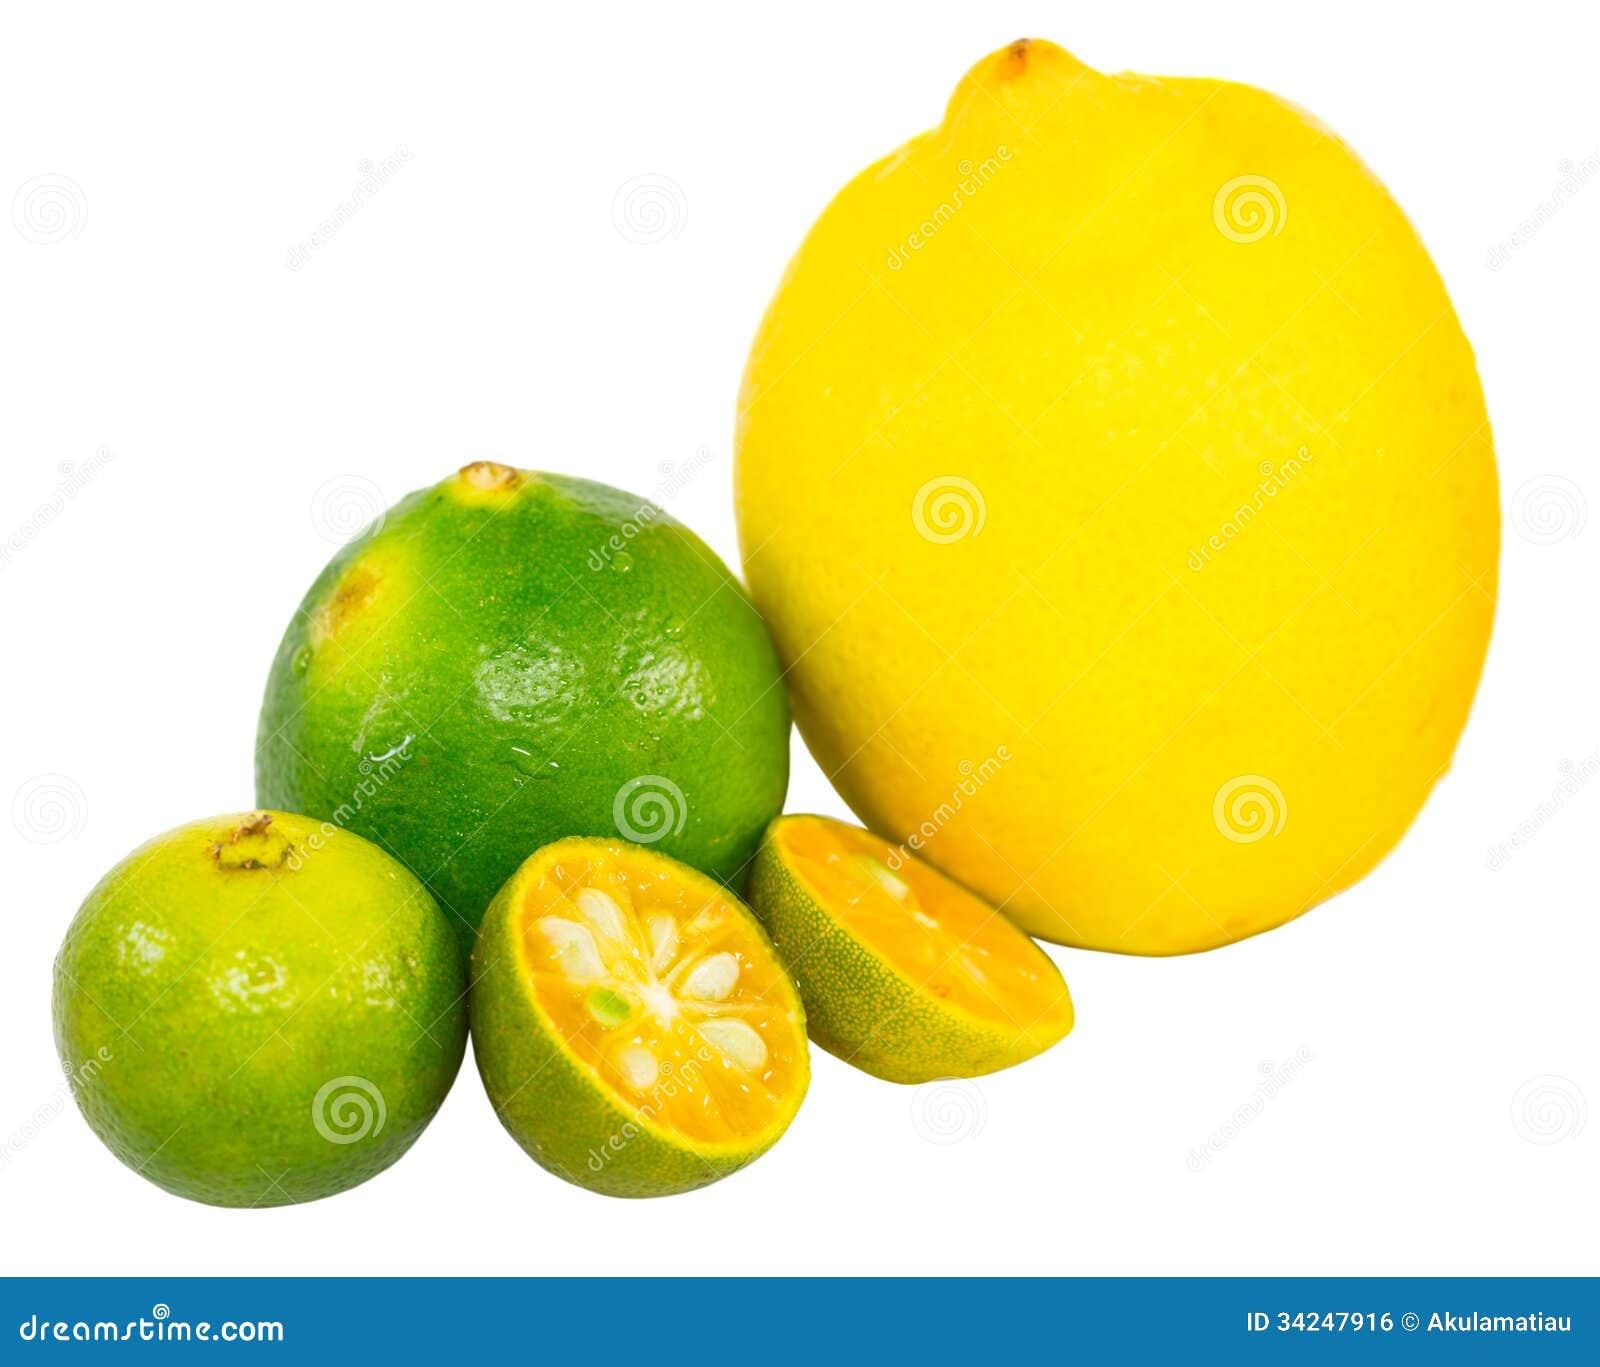 Key Lime Green Calamansi Lime And Lemon Vii Royalty Free Stock Image